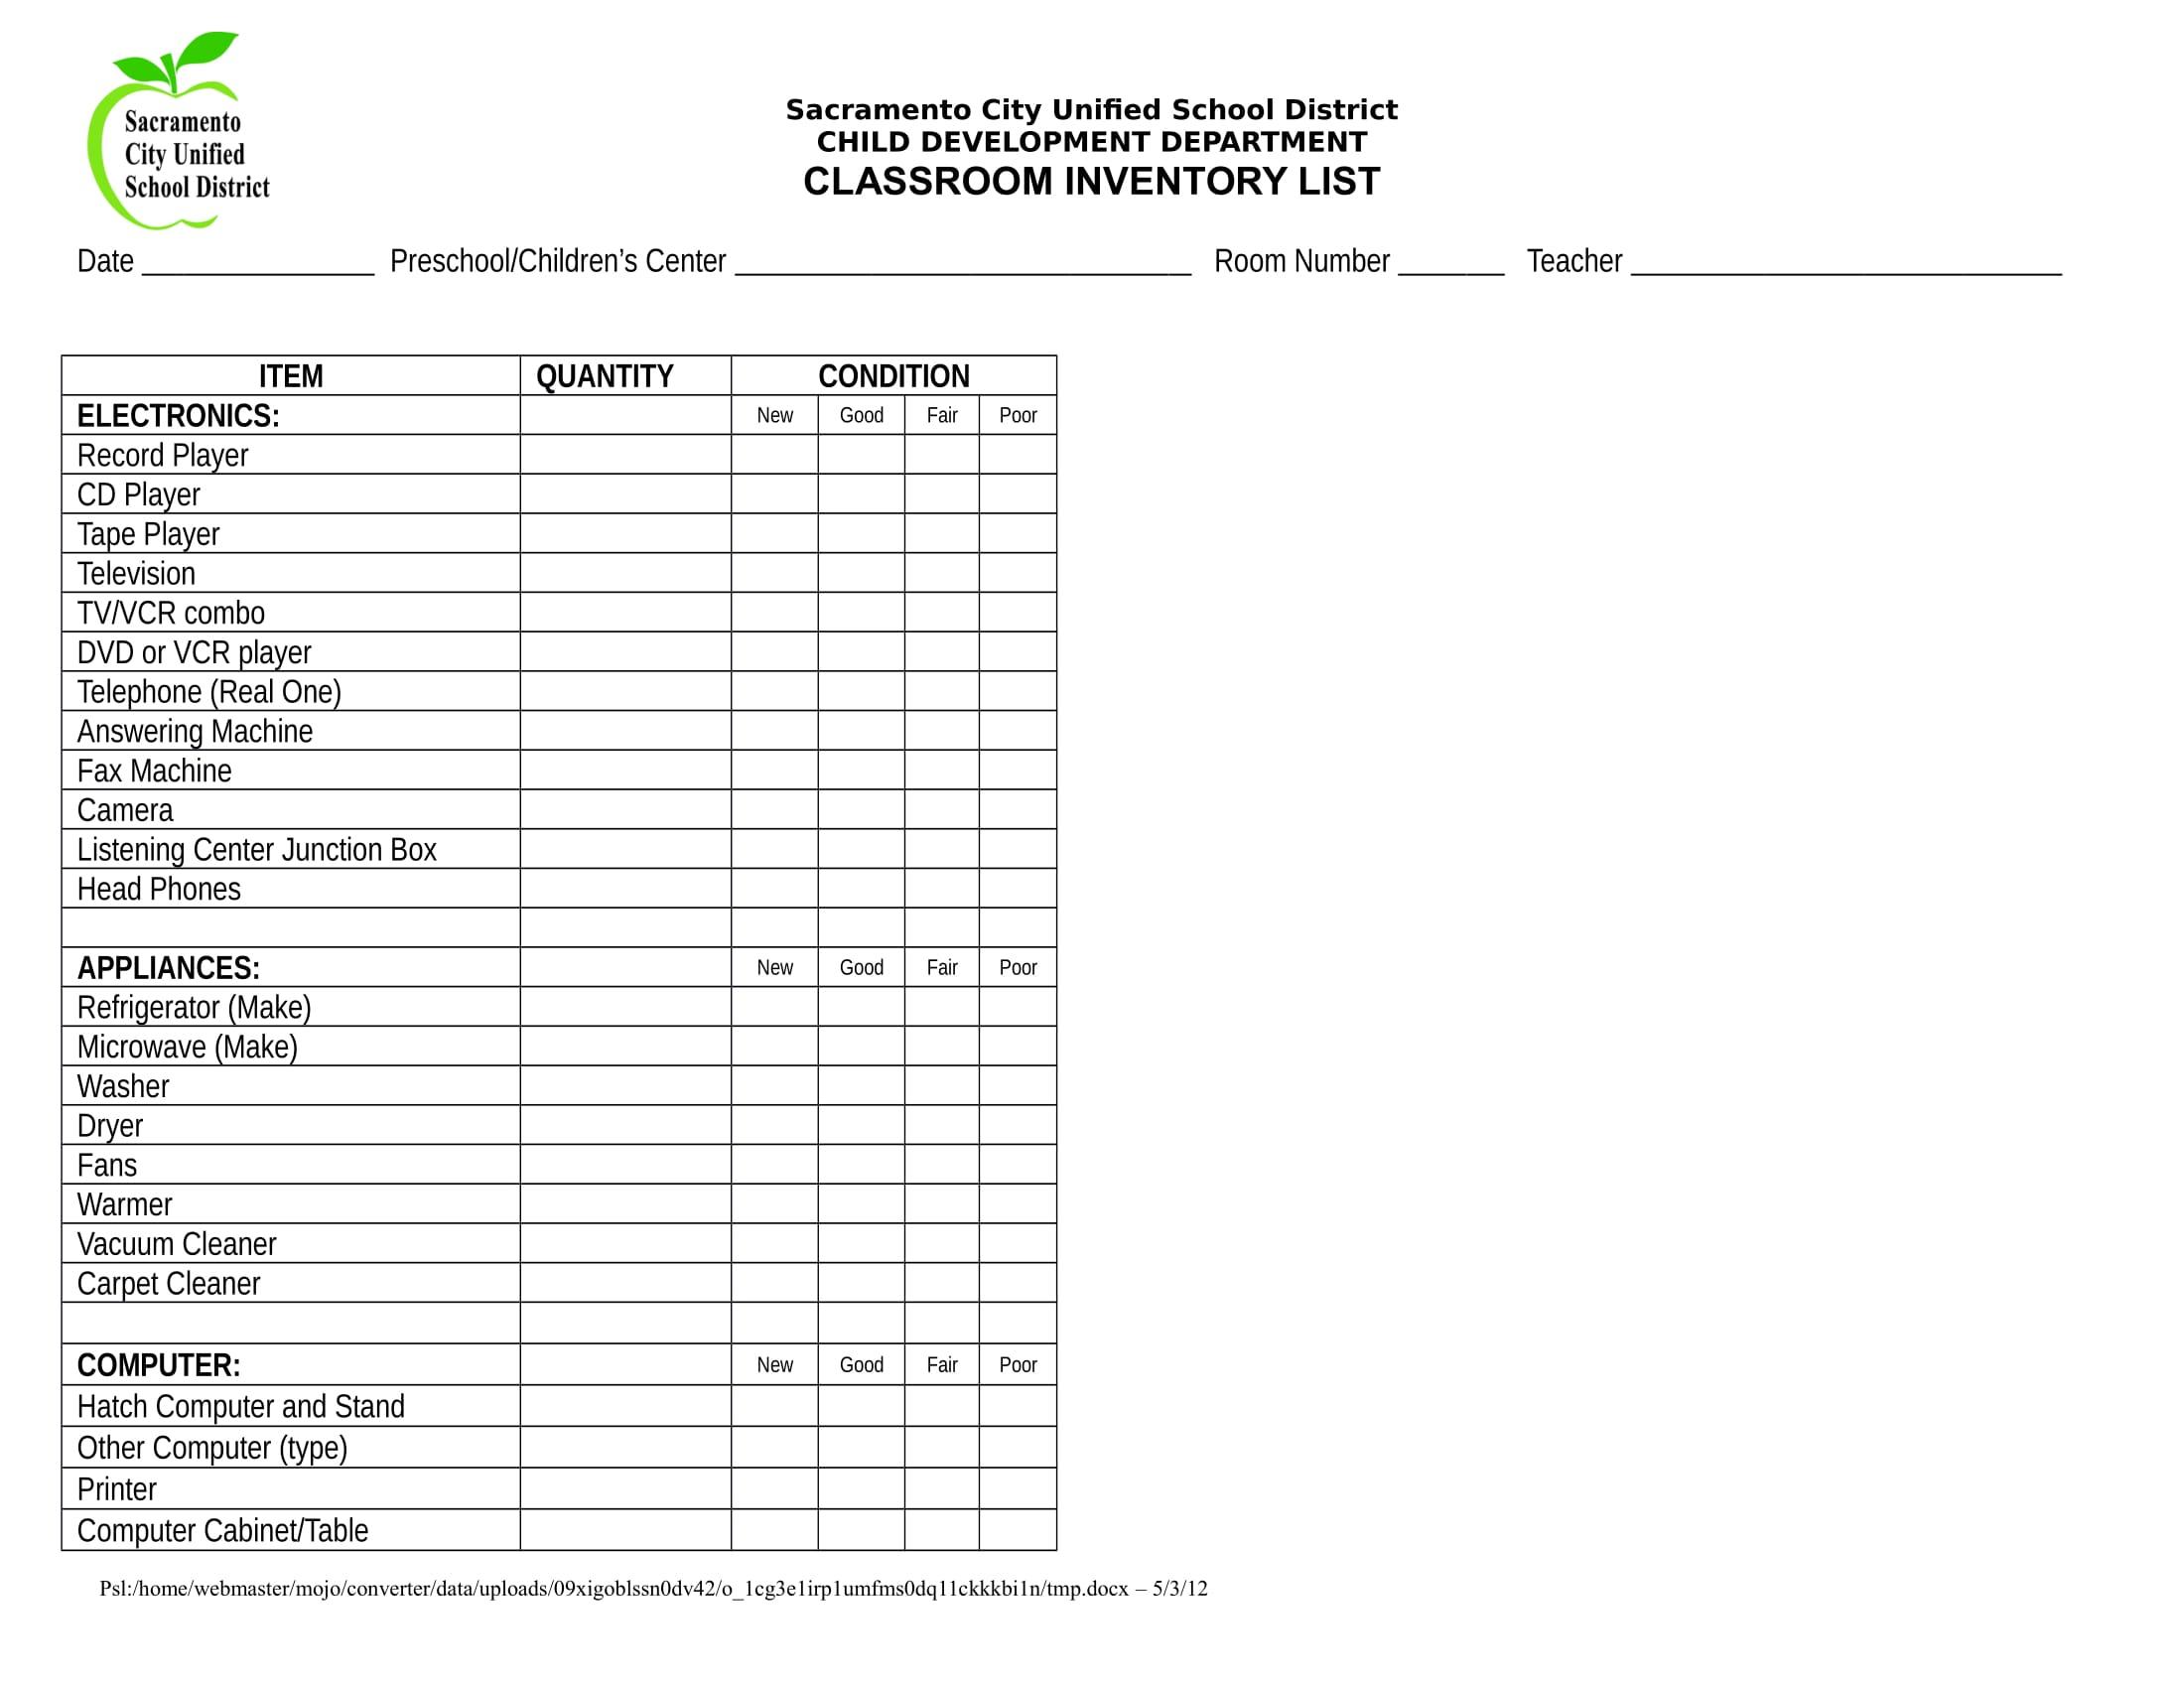 classroom inventory list example